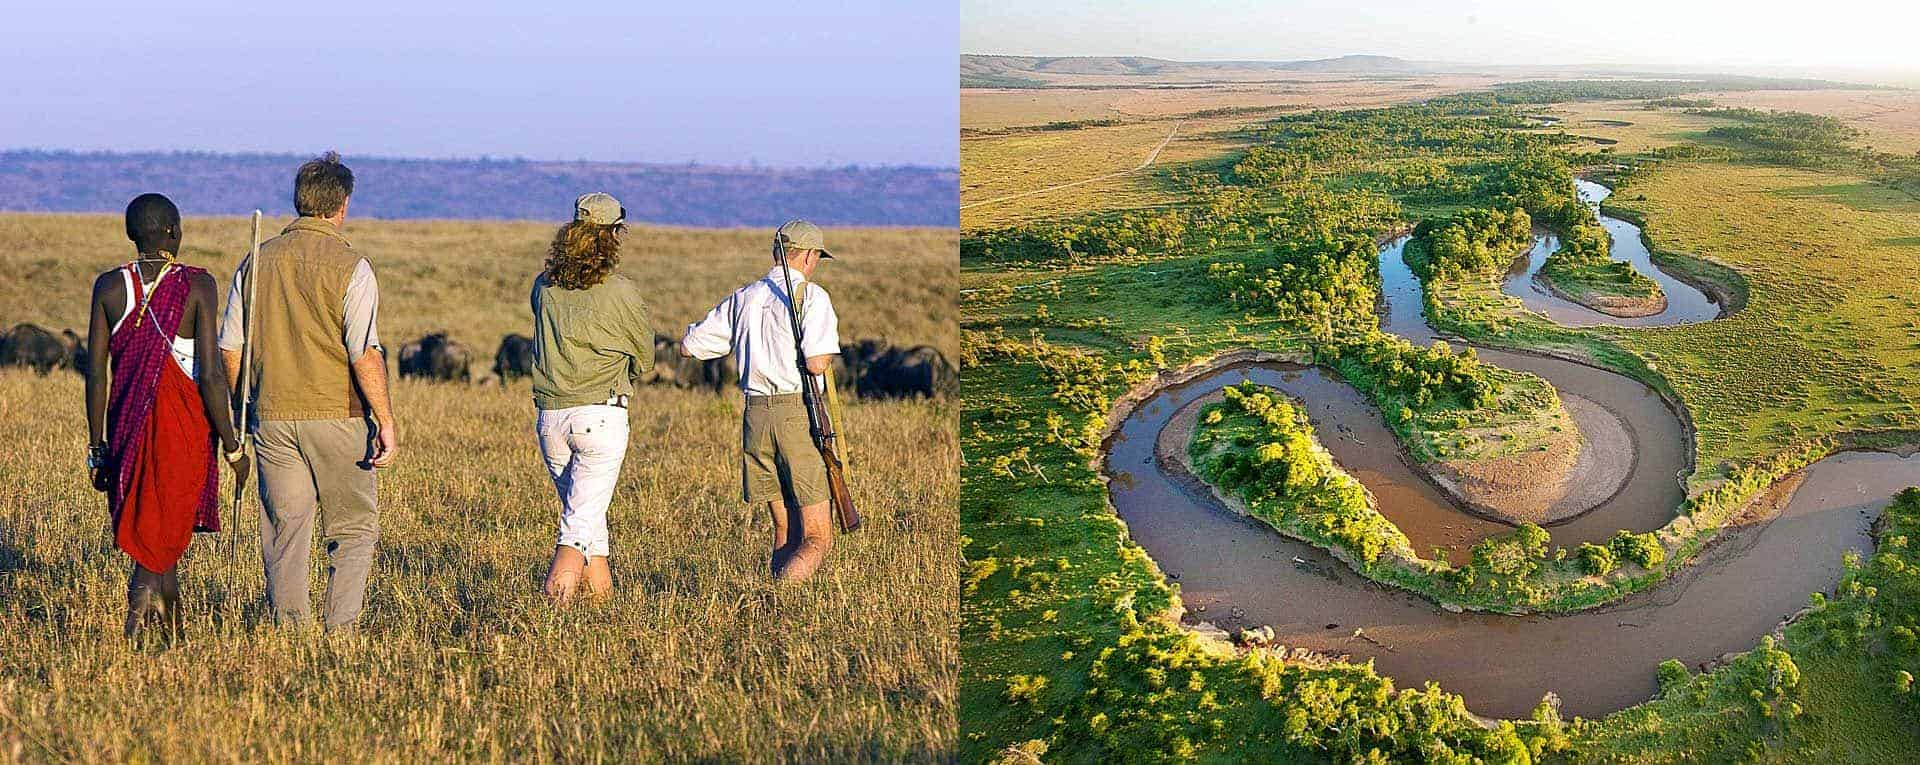 Governors IL Moran Camp Masai Mara Kenya AfricanMecca